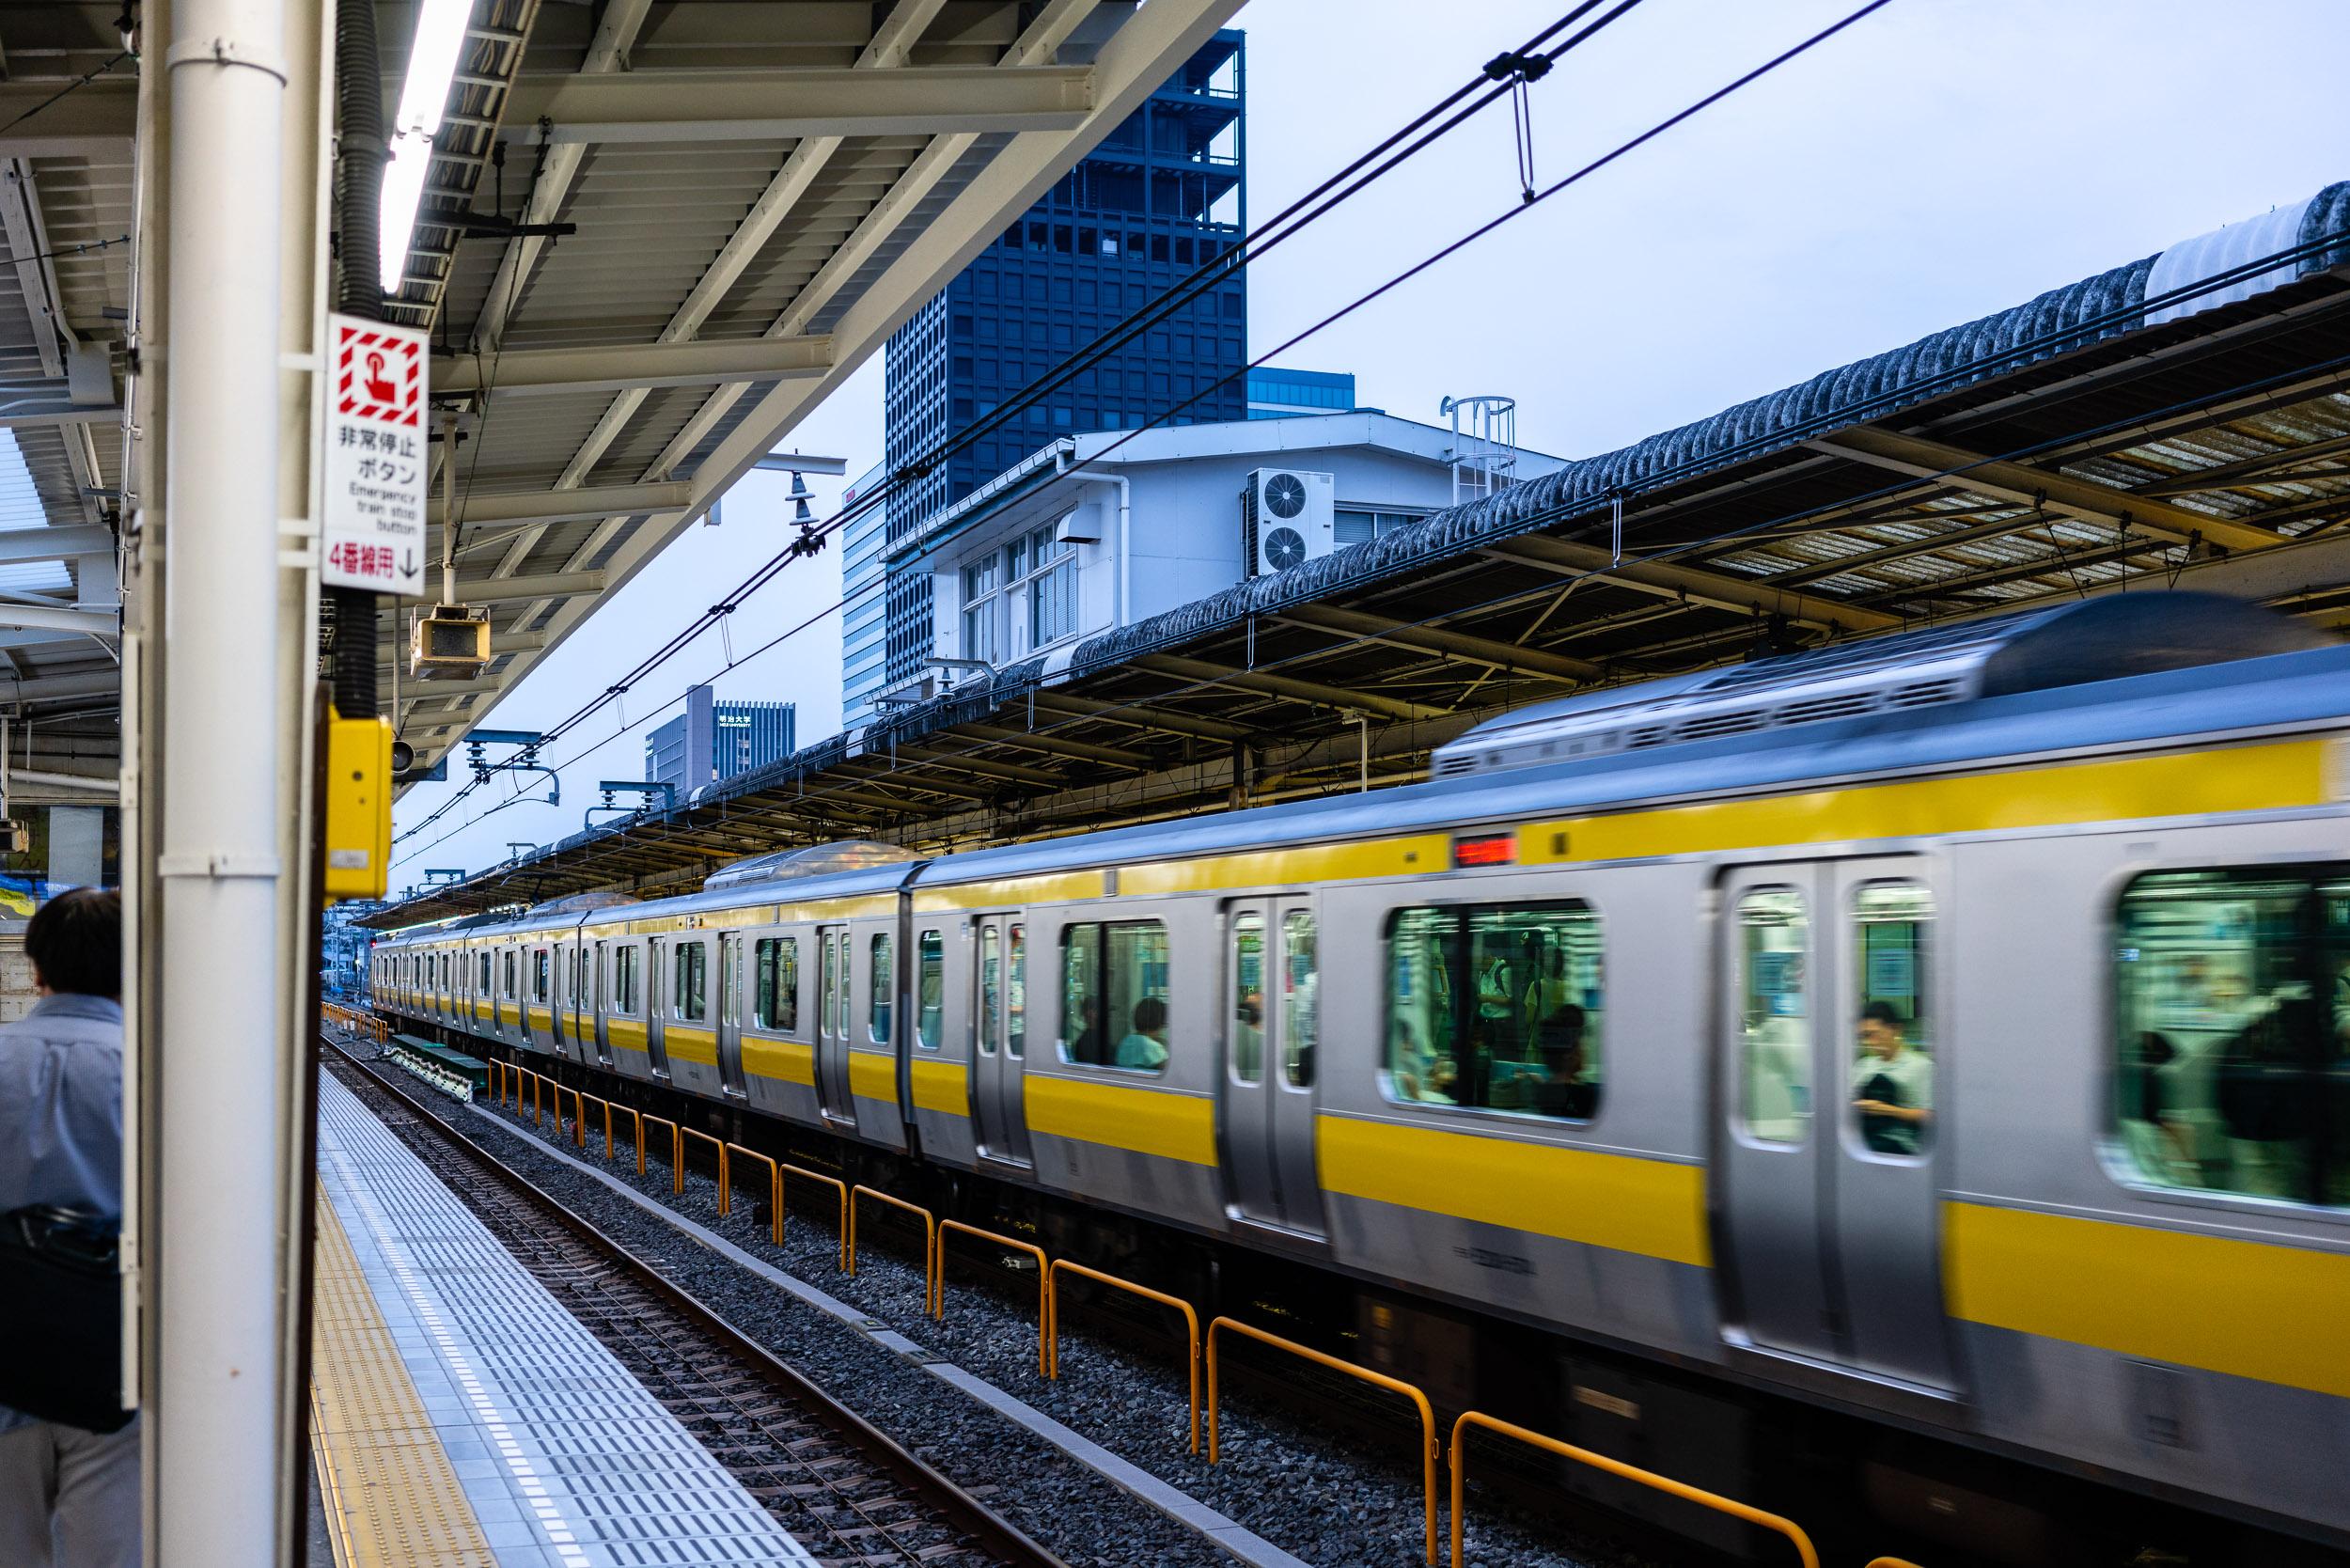 20190720-DSC06052-japan-escape-2019.jpg